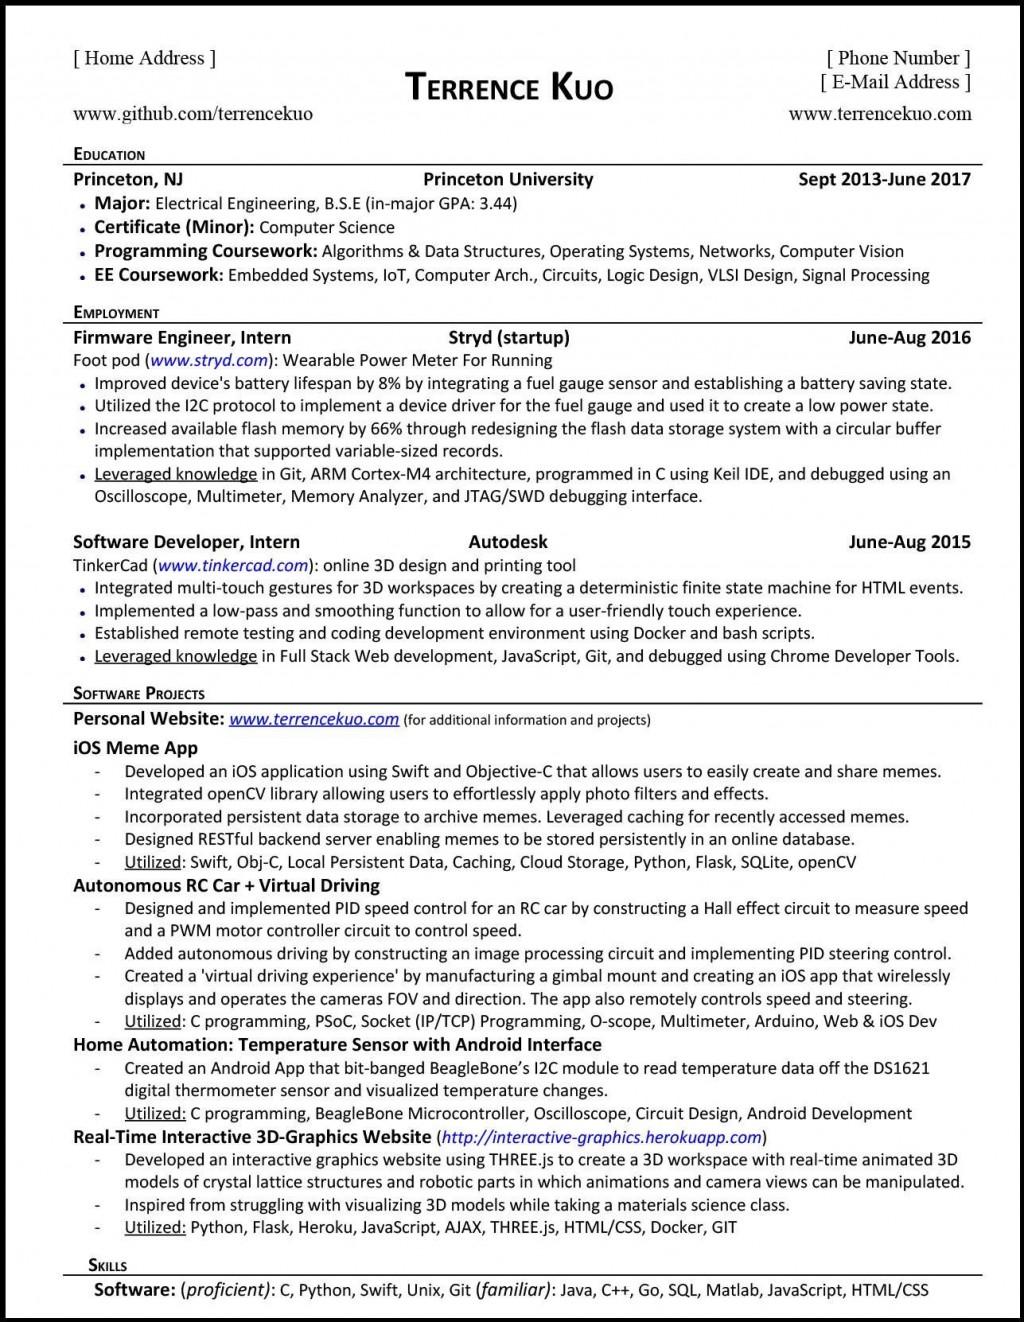 000 Top Software Engineering Resume Template High Resolution  Engineer Microsoft Word Cv Free Developer DownloadLarge